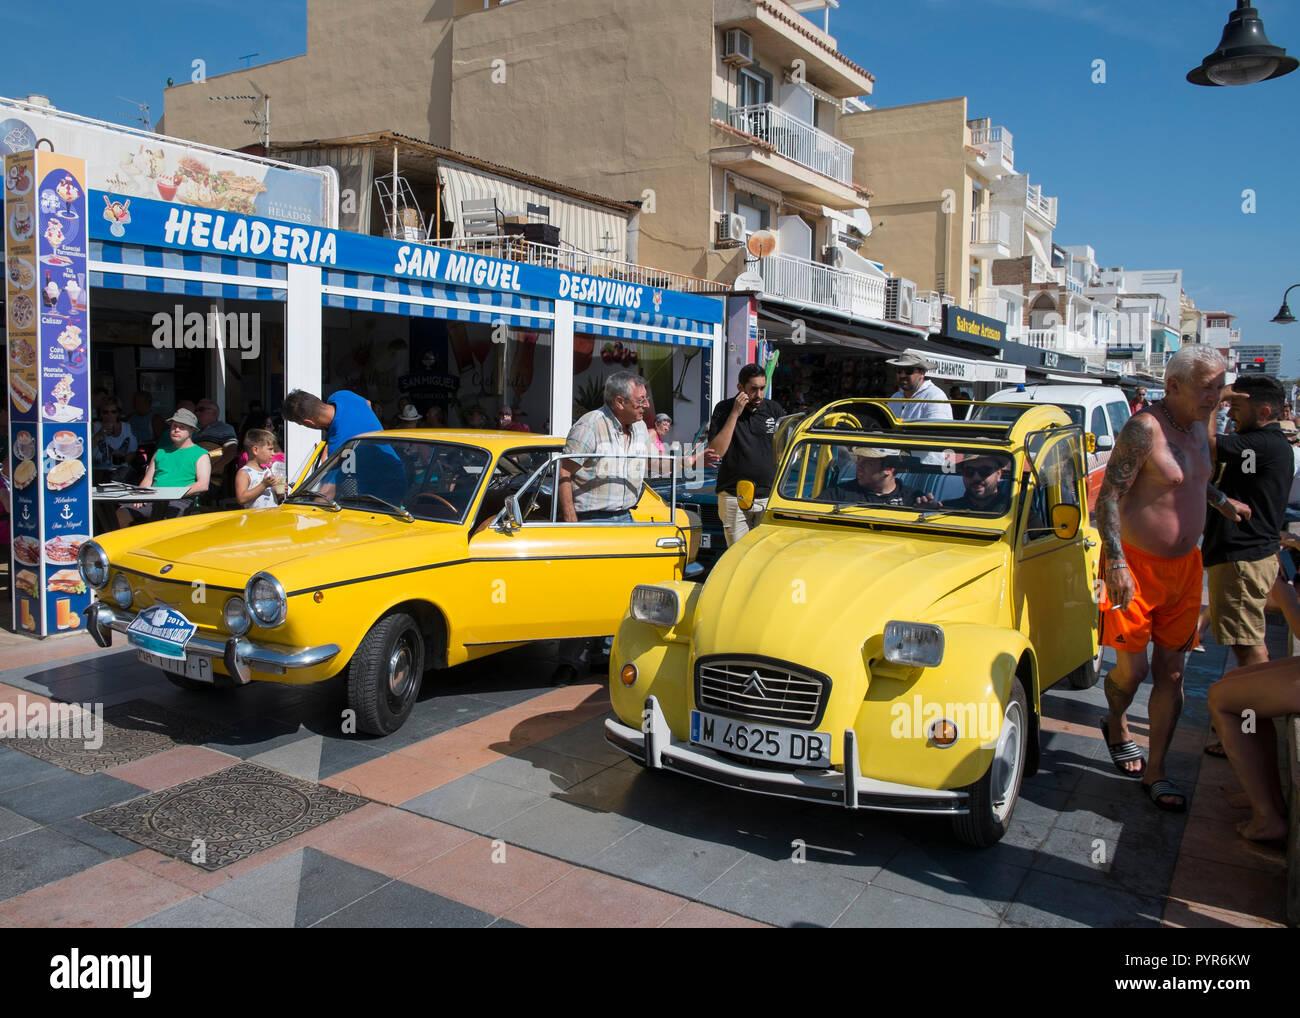 Fiat 850 Sport Coupe - Citroën 2CV. Classic car meeting in Torremolinos, Málaga, Spain. - Stock Image